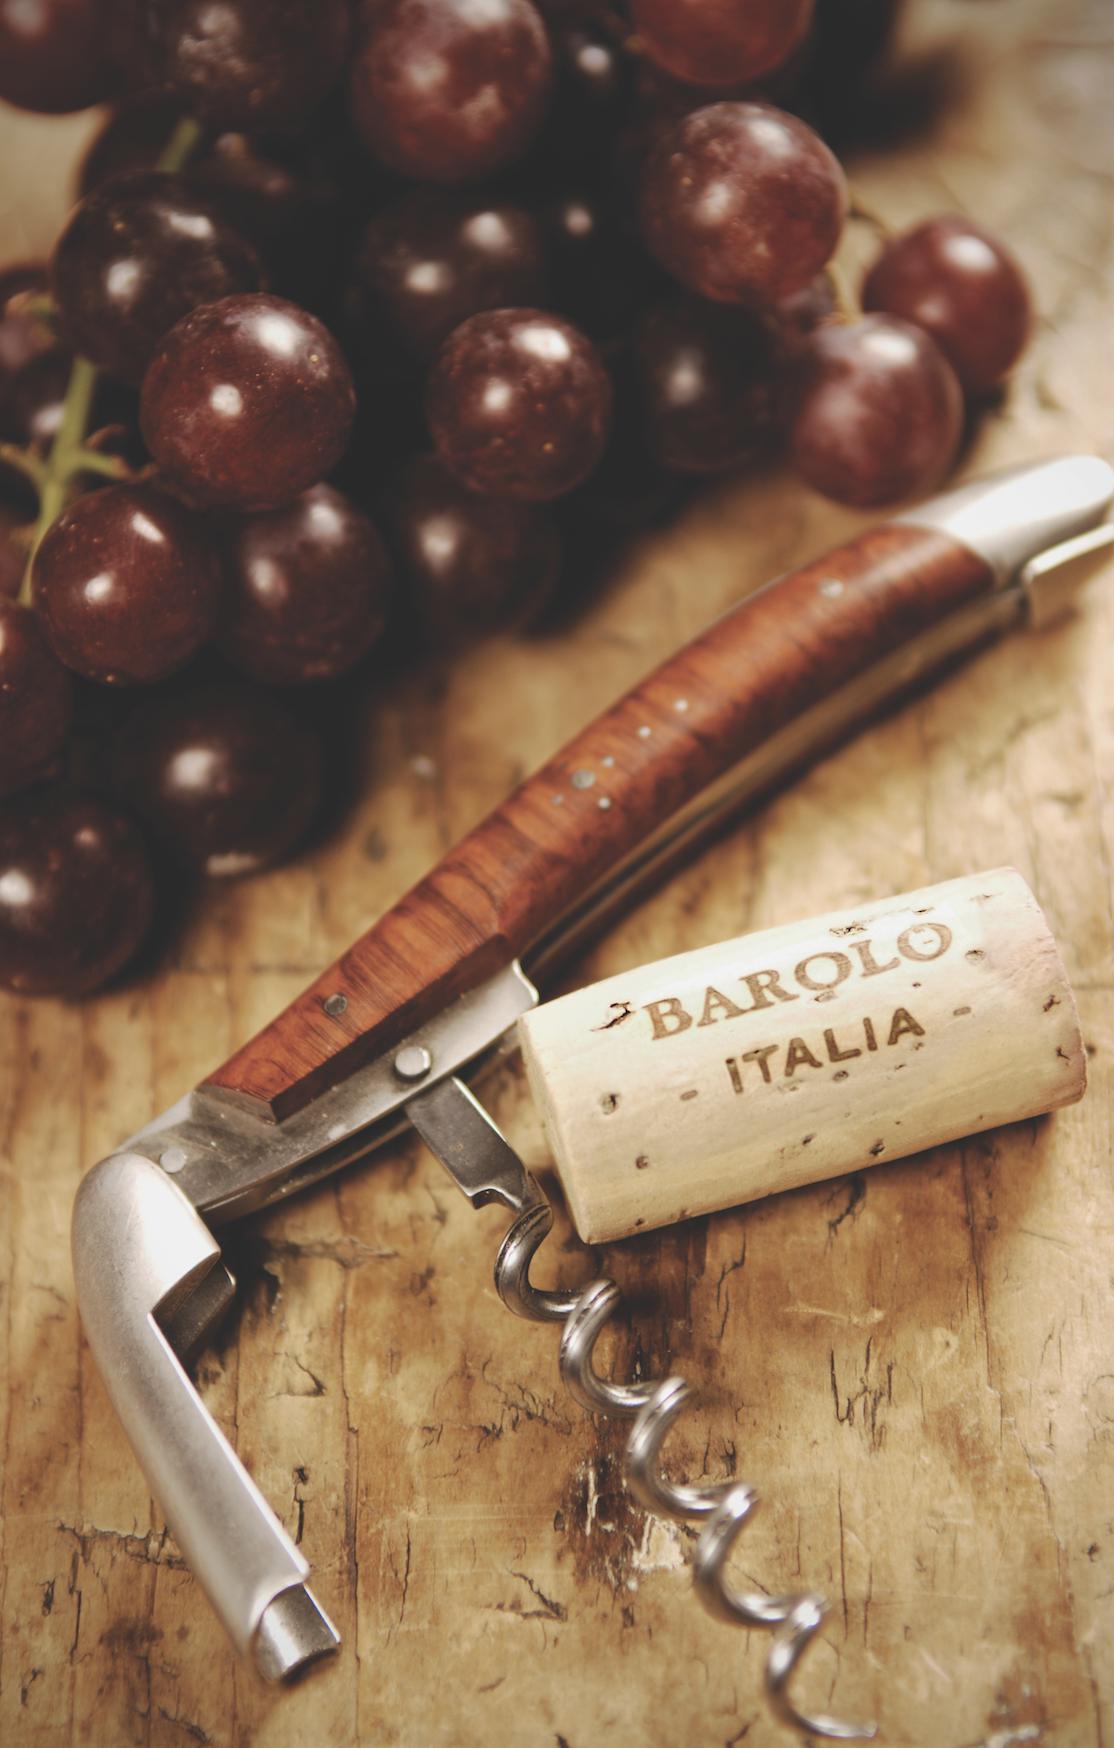 Barolo Wine - Italia! Icons